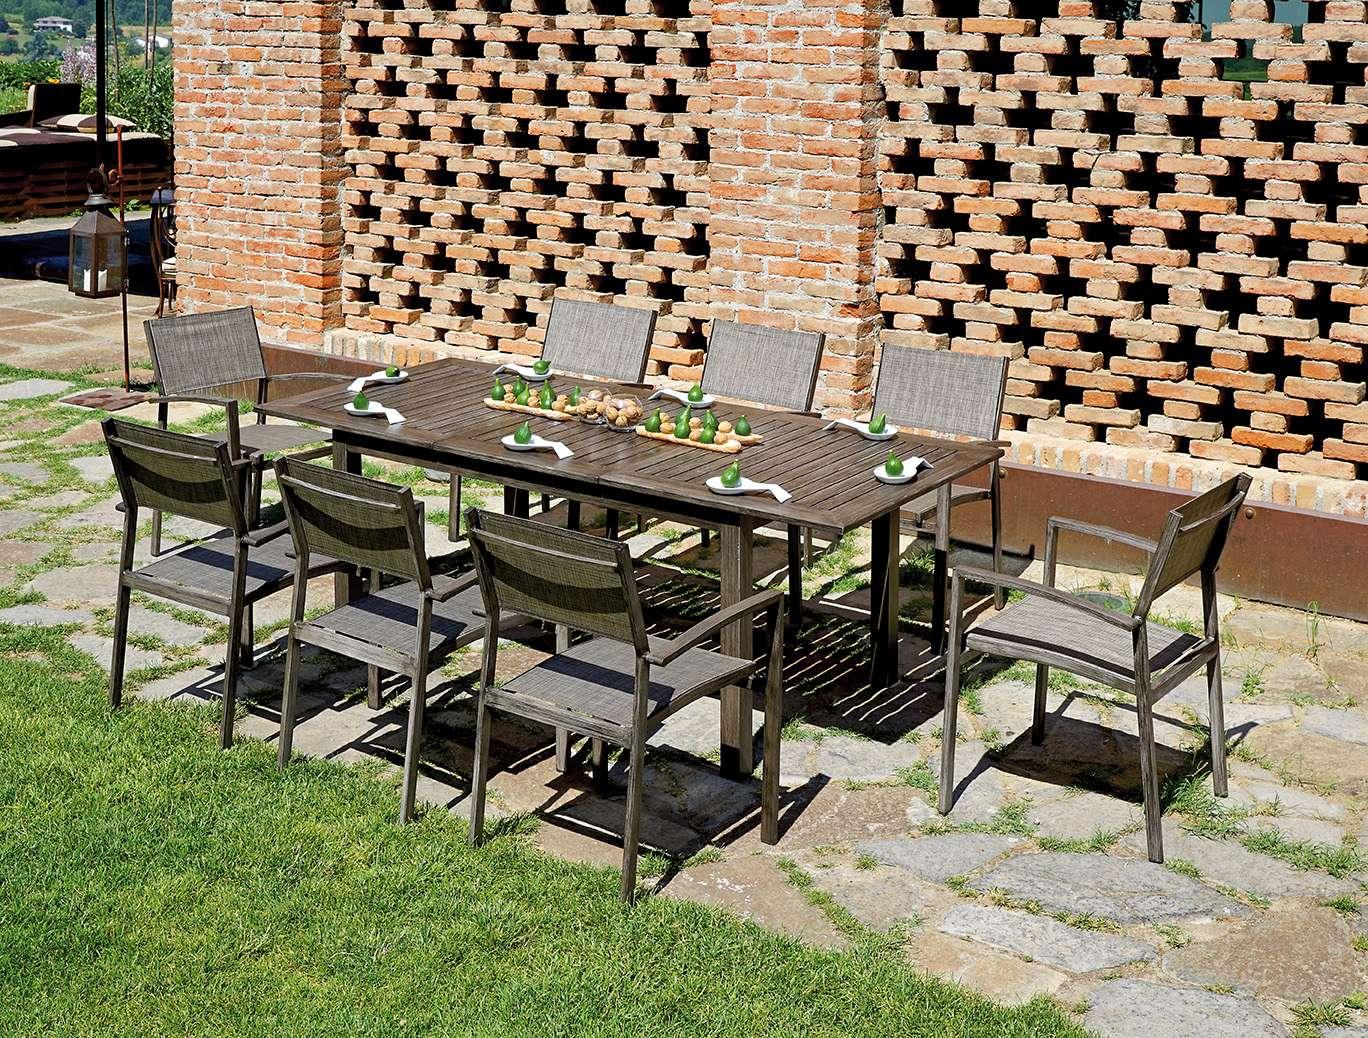 Ambientazione cwl01 twl02 greenwood mobili da giardino - Mobili da giardino in teak ...